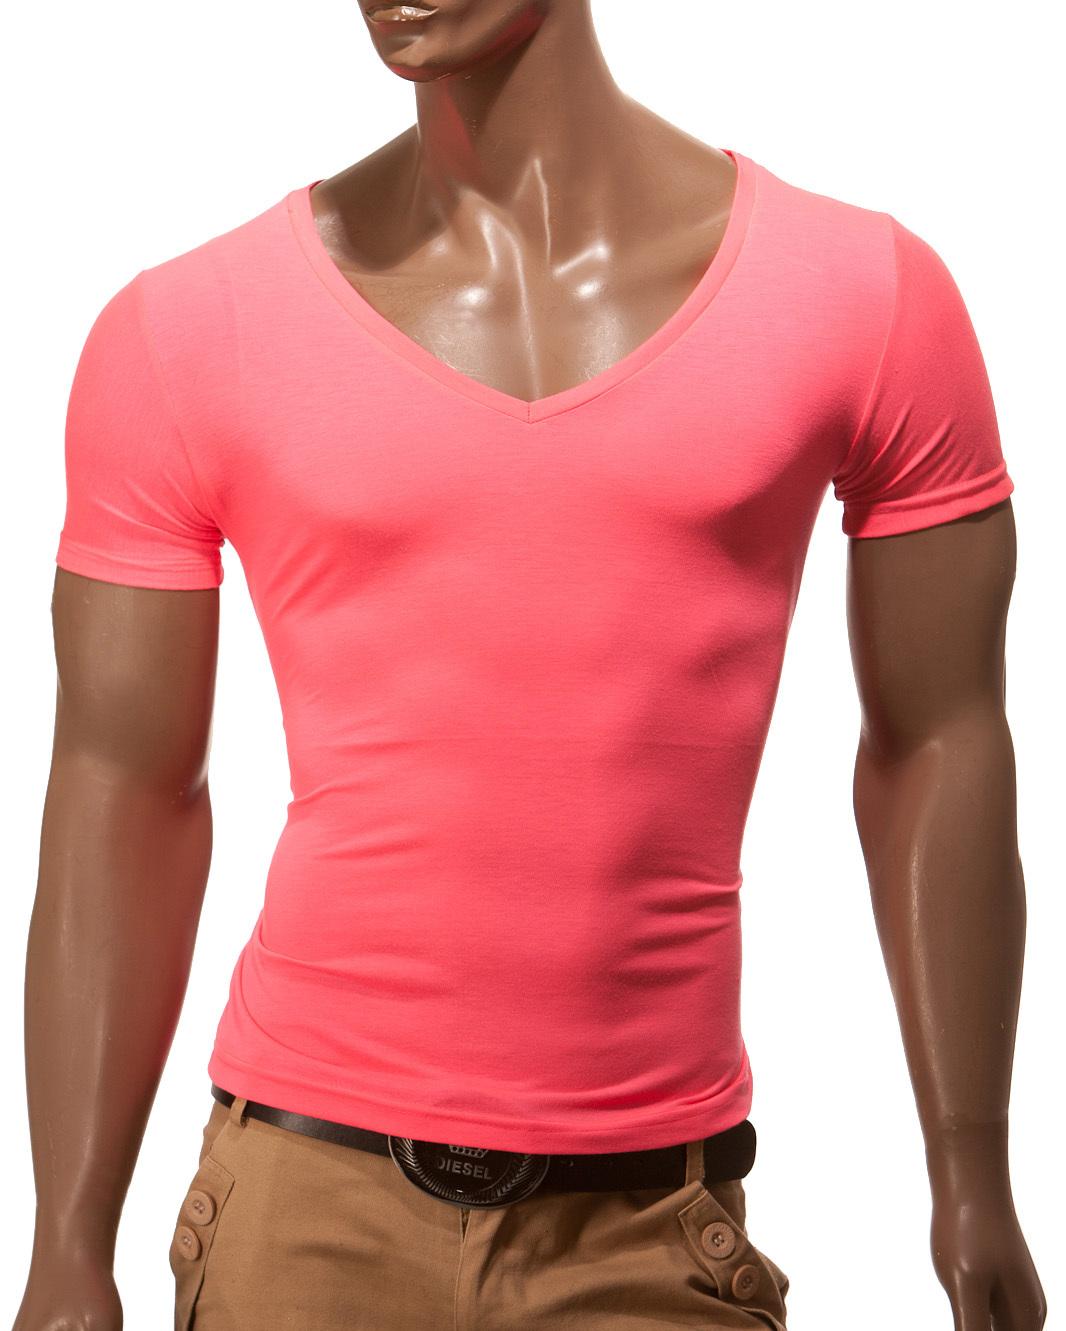 balandi herren t shirt poloshirt sweatshirt clubwear. Black Bedroom Furniture Sets. Home Design Ideas